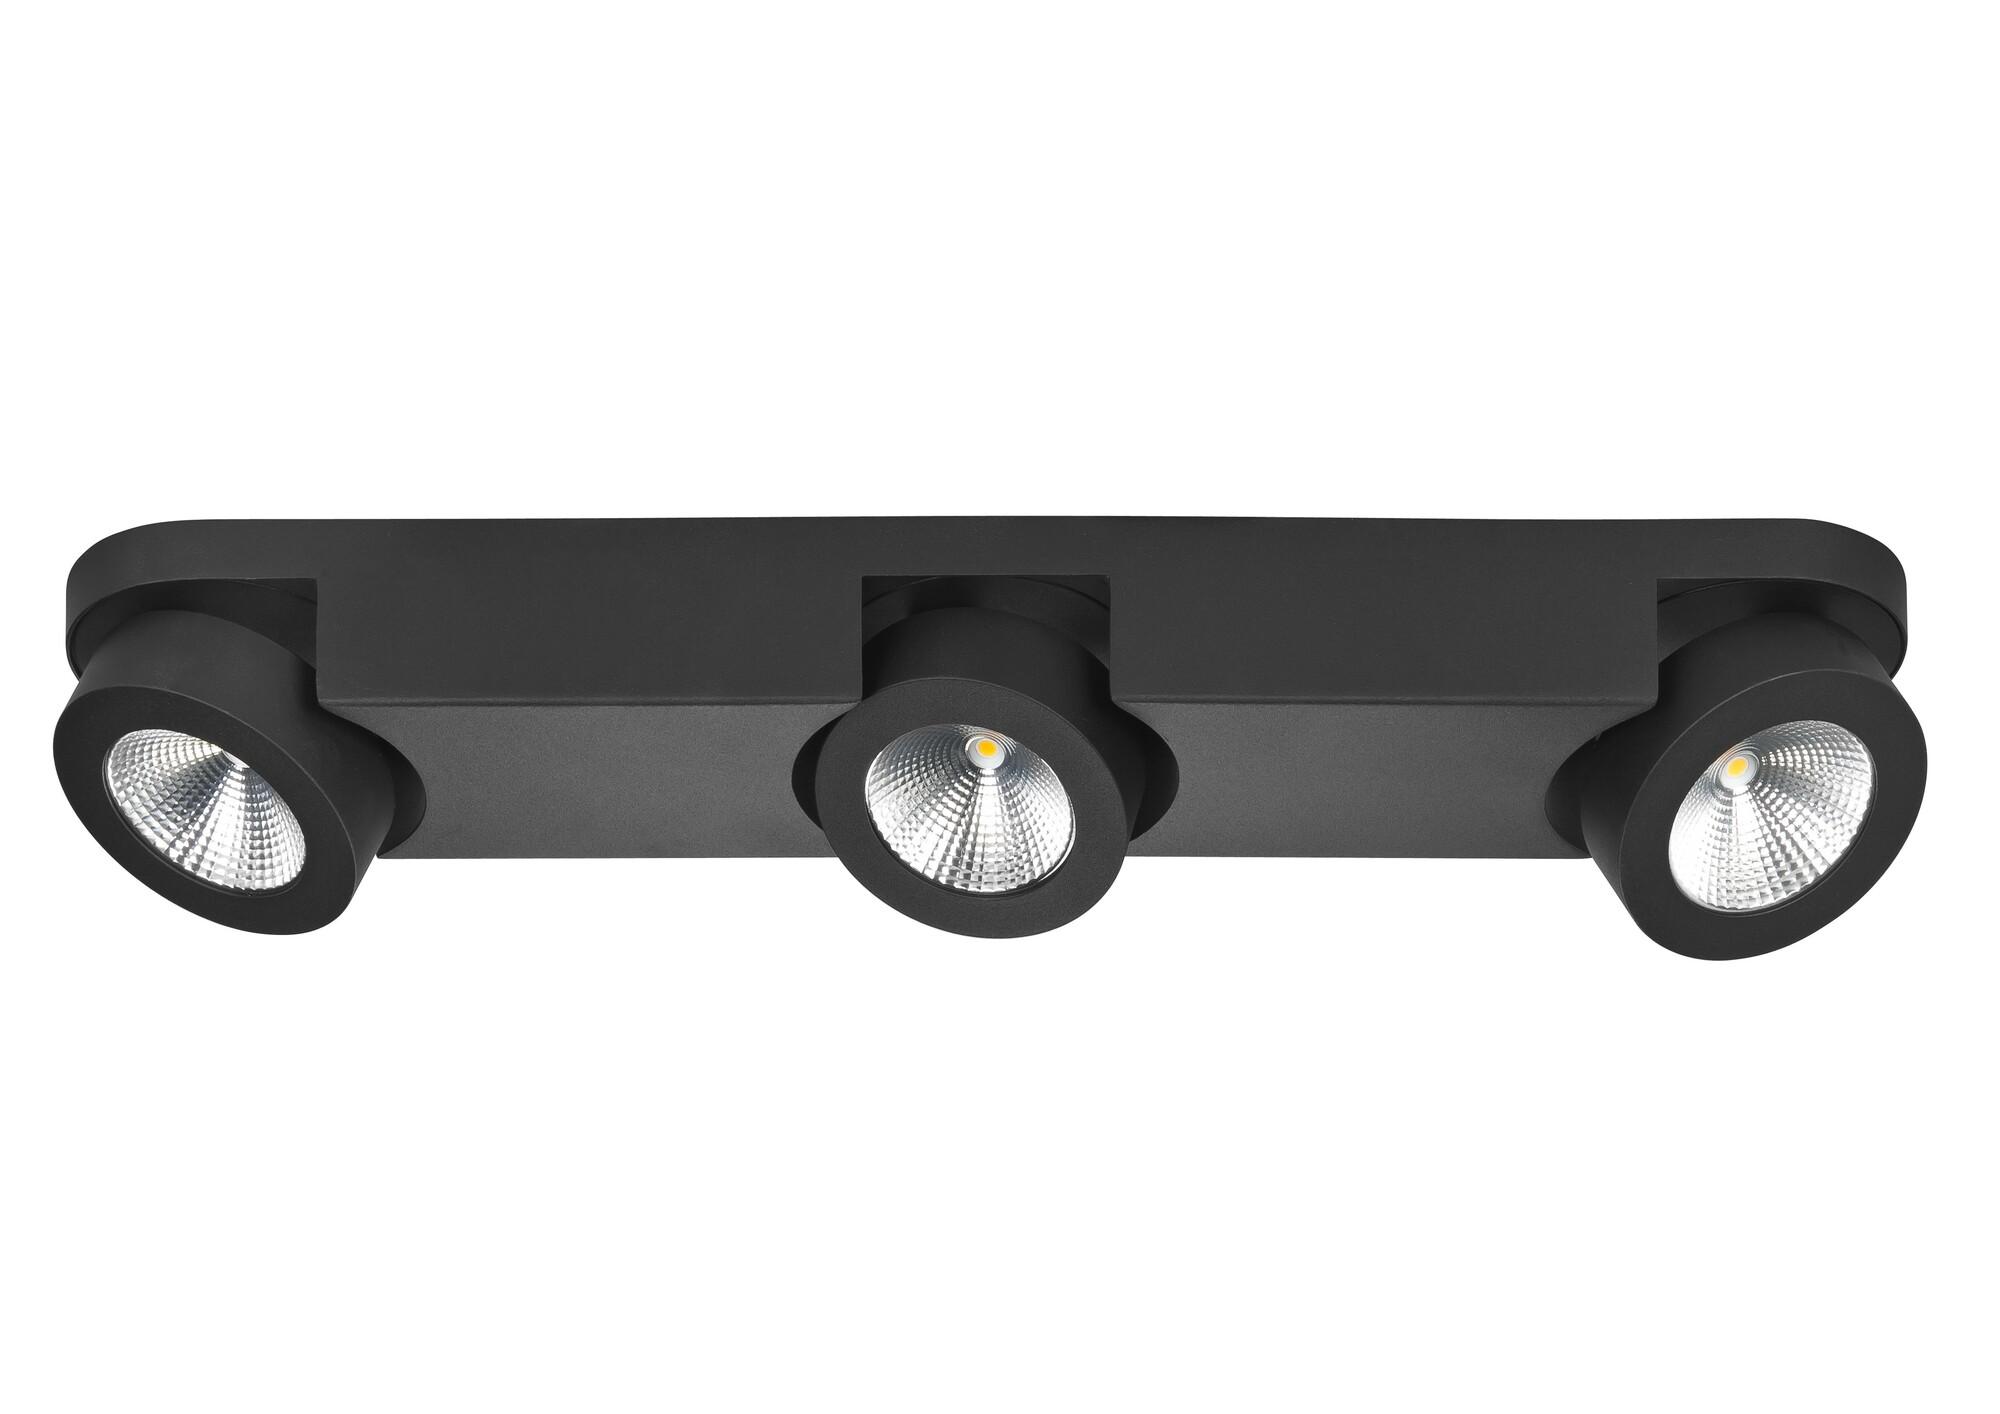 MONTI Opbouwspot LED 3x5W/450lm Zwart